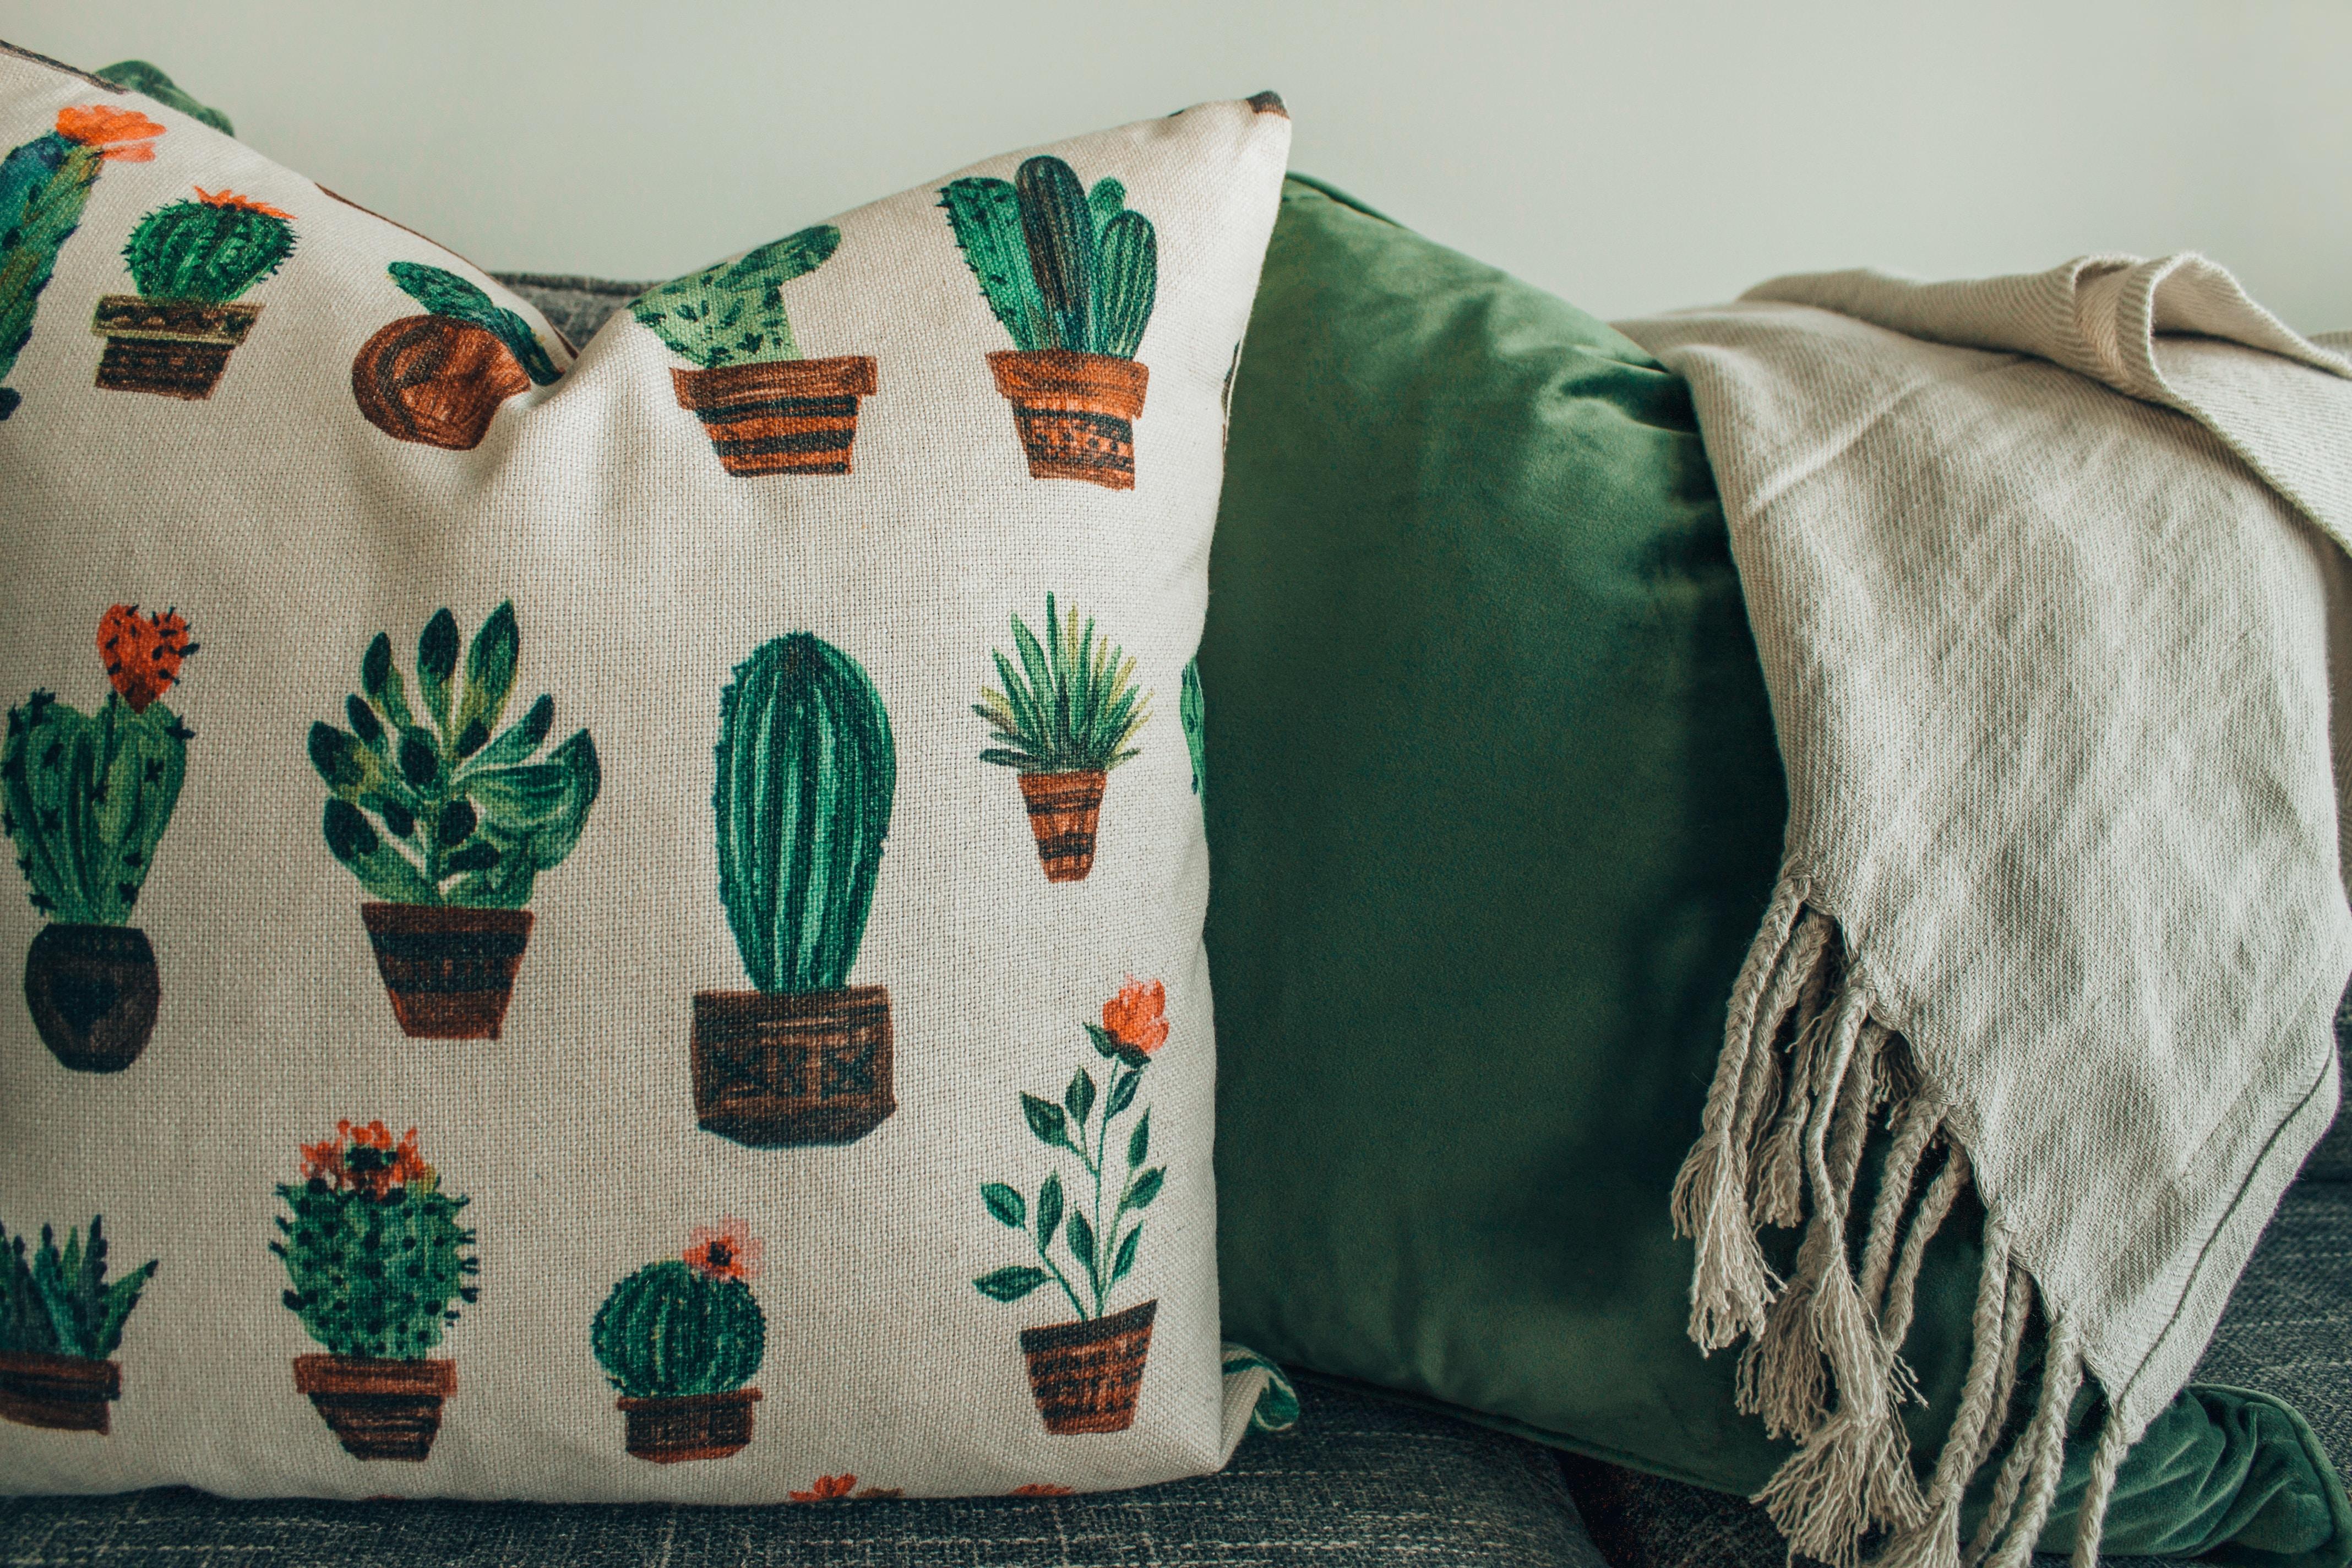 cactus-printed throw pillows on chair